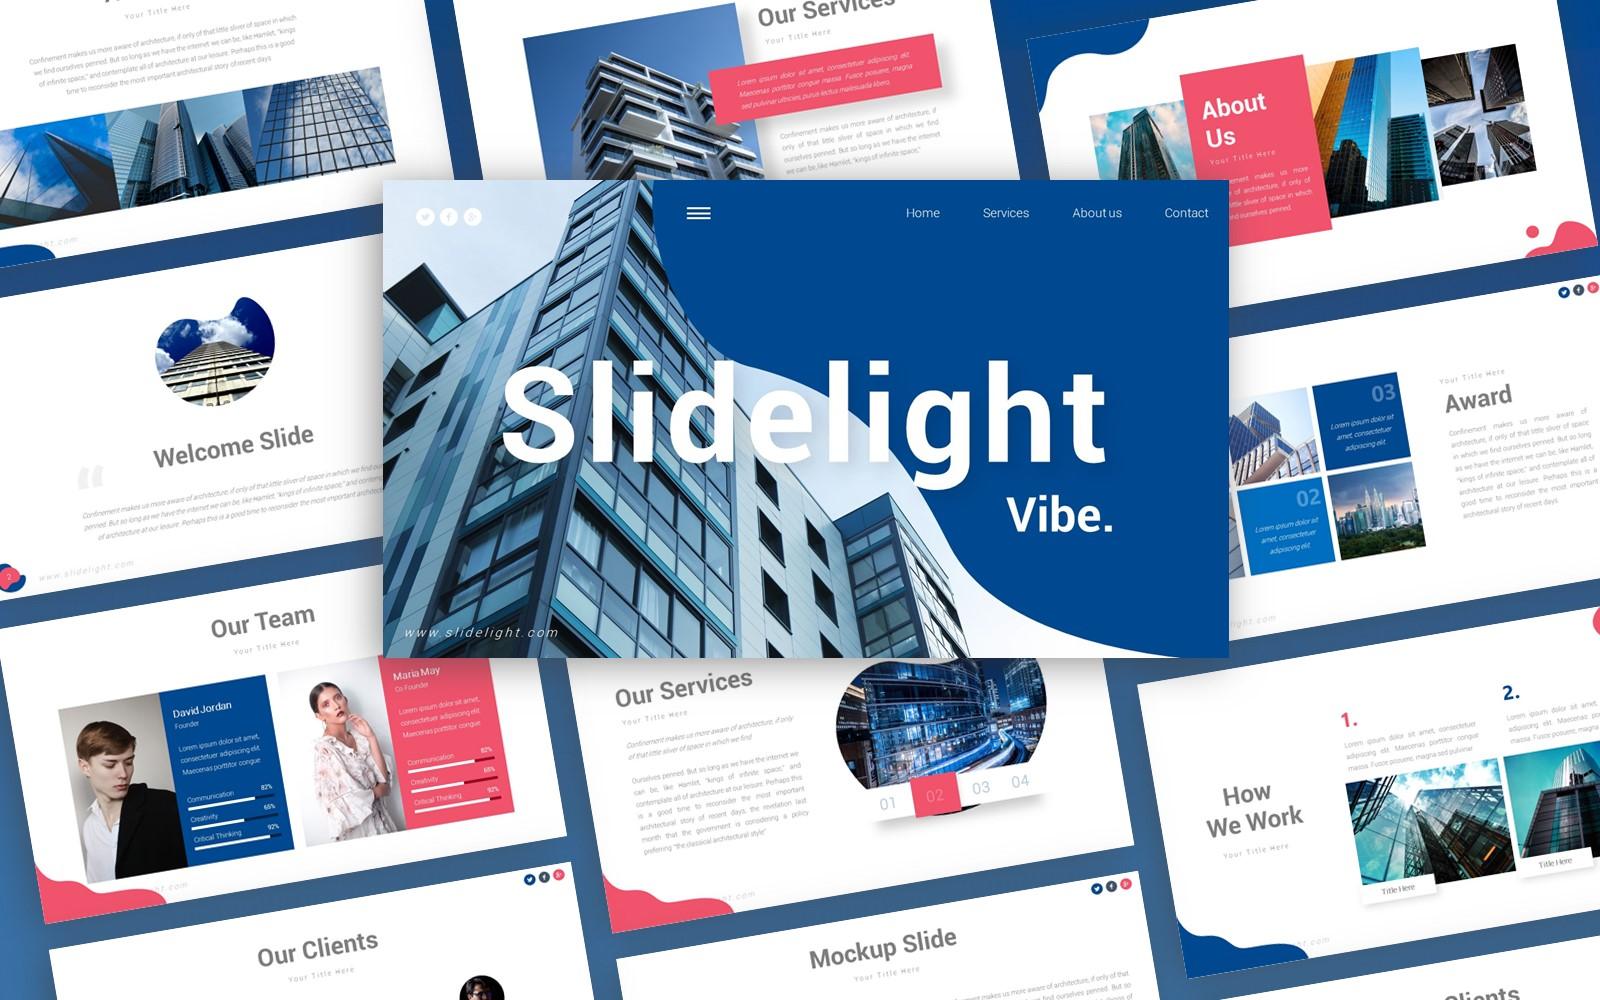 Skylight Architecture Presentation PowerPoint template